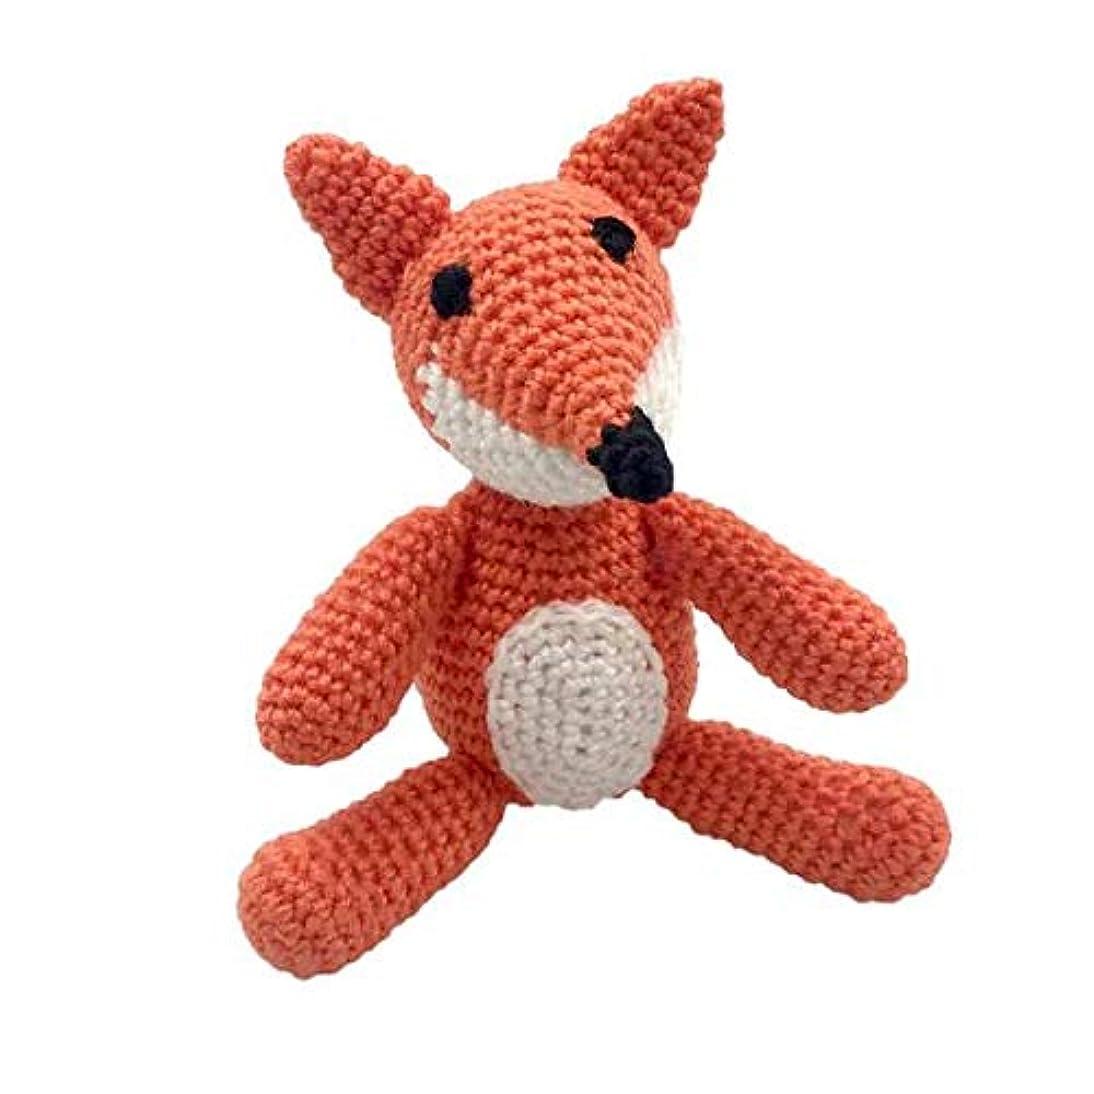 Darn Good Yarn Craft Amigurumi Crochet Starter Kit with Yarn - DIY Knitting Kit for Beginners - Fox Knit and Crochet Pattern